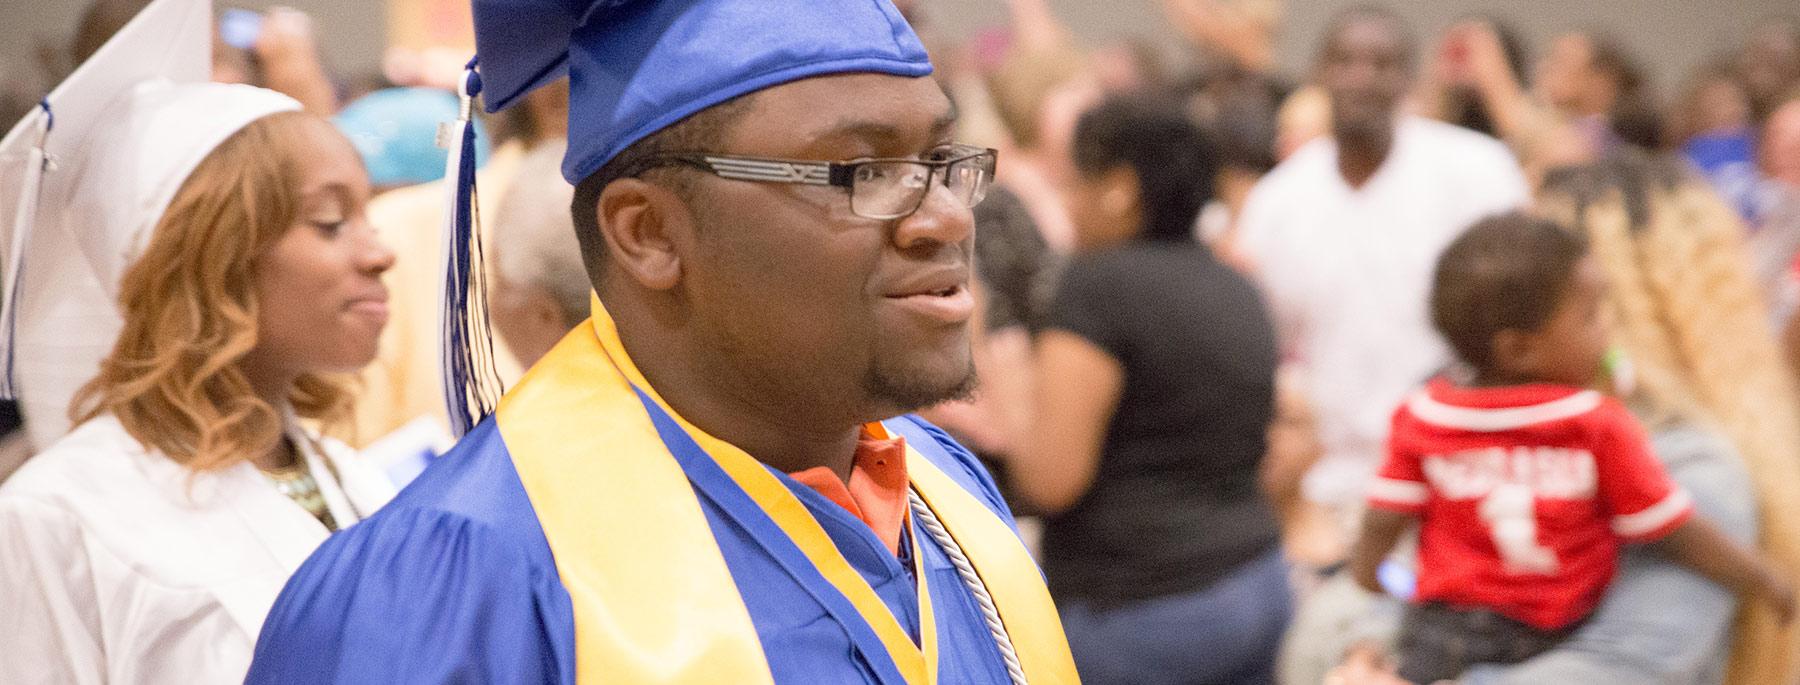 Indianapolis Metropolitan High School Graduate